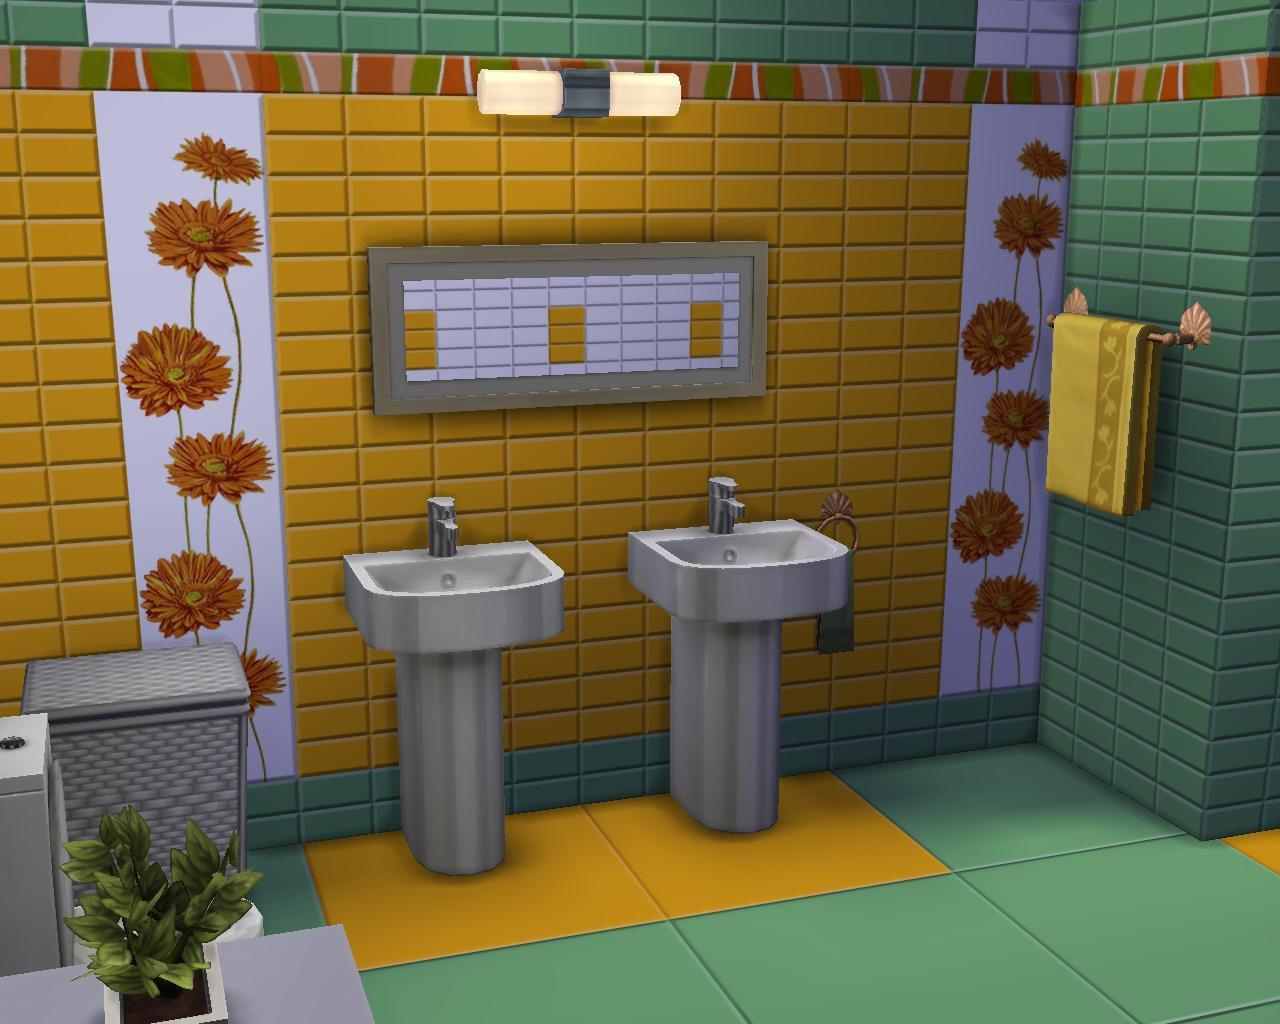 http://i5.imageban.ru/out/2014/10/31/cde110d51ed73868897f9c07f50dd7e4.jpg